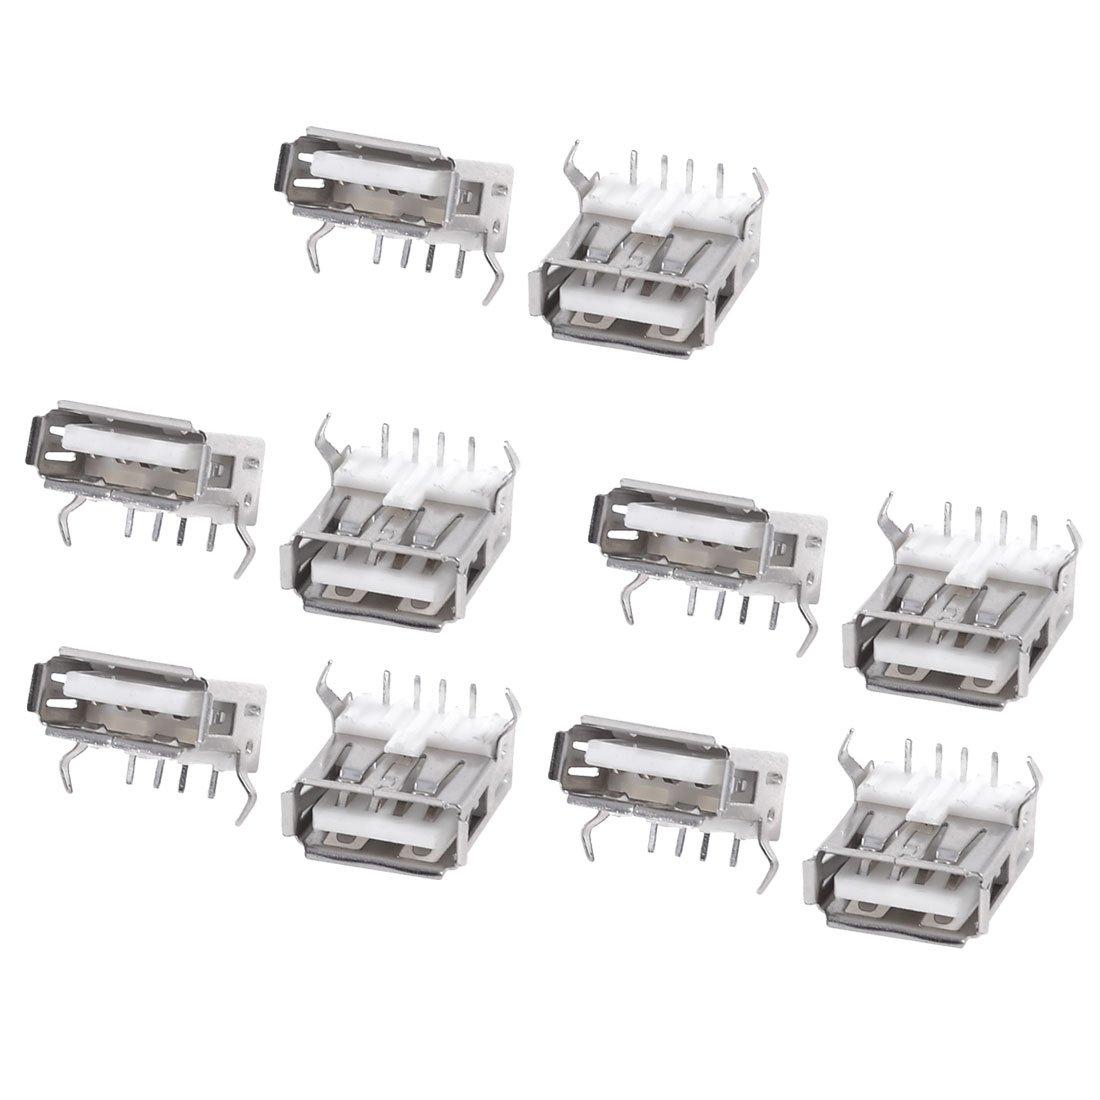 10PCS USB Type A Standard Port Female Solder Jacks